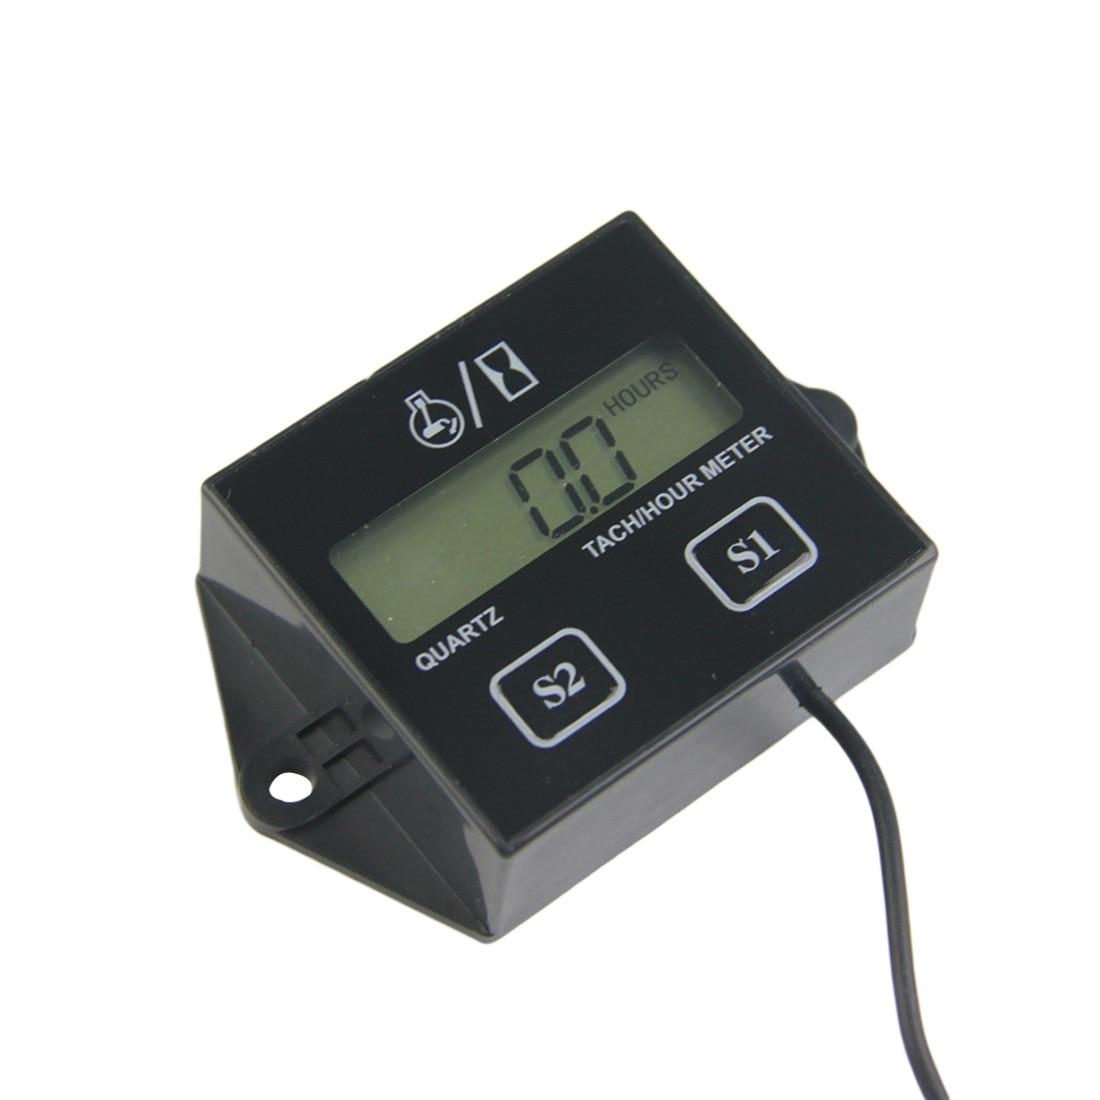 Tecnologia de Faísca do motor Indutivo Hour Meter Tacômetro Do Motor Digital Medidor Para Motocicleta Motor de Acidente Vascular Cerebral